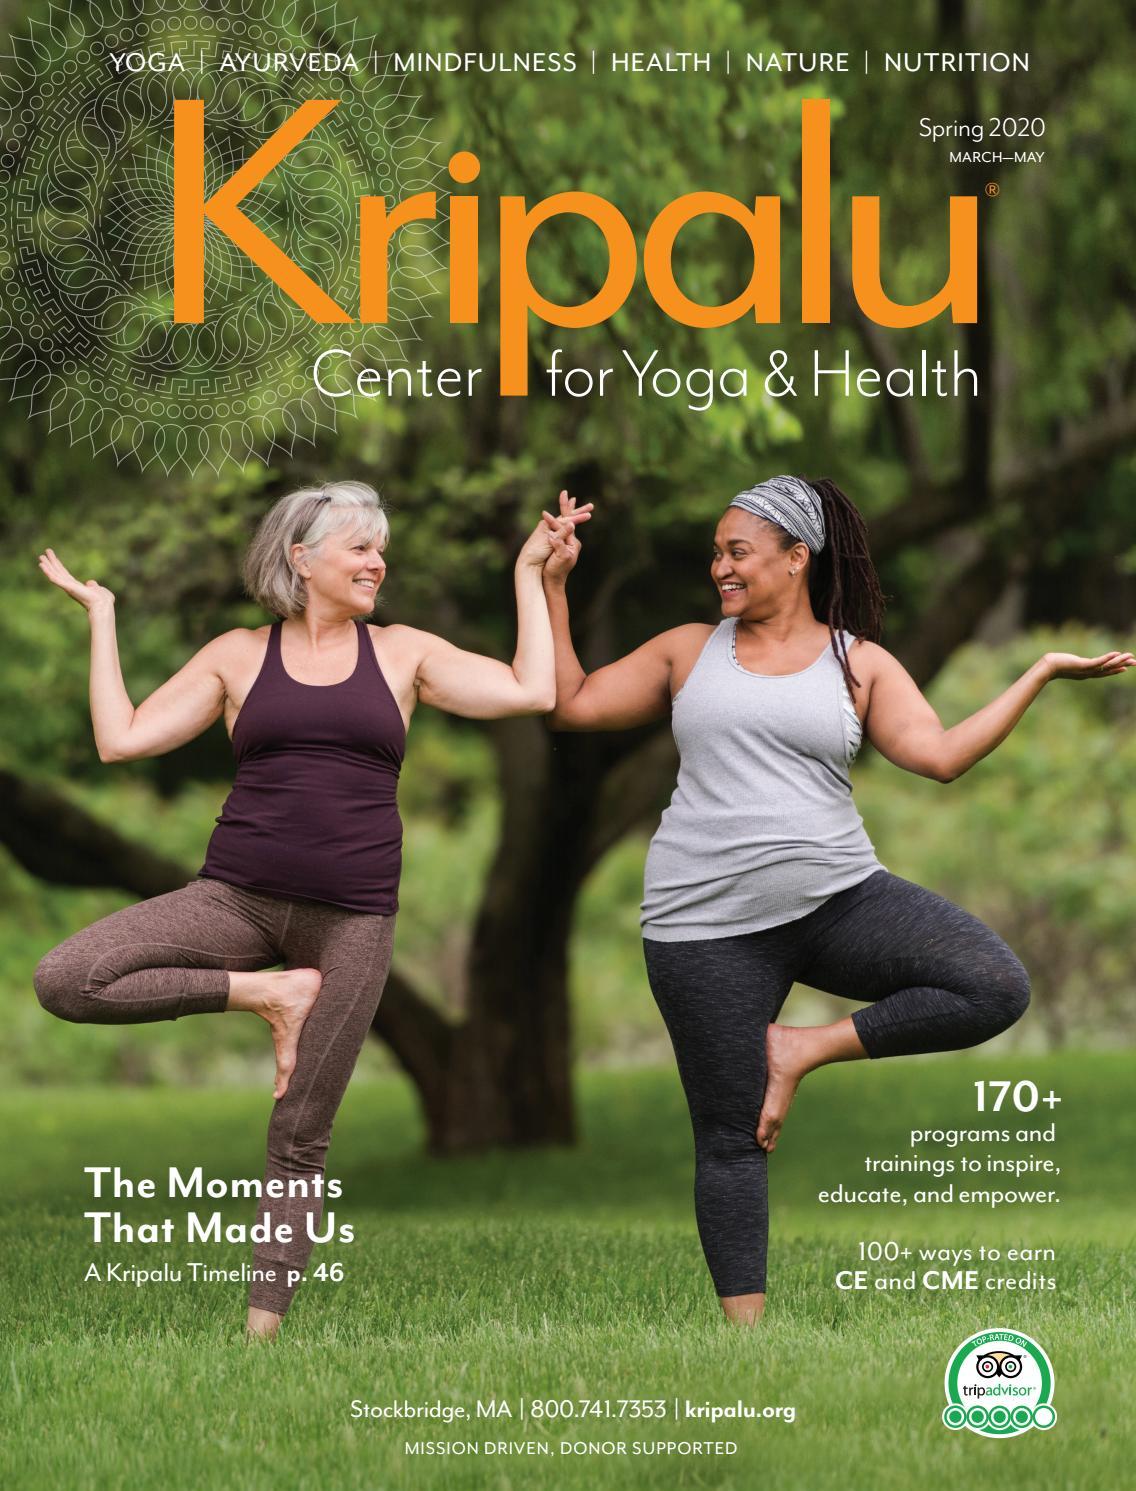 2020 Kripalu Spring Catalog By Kripalu Center For Yoga Health Issuu